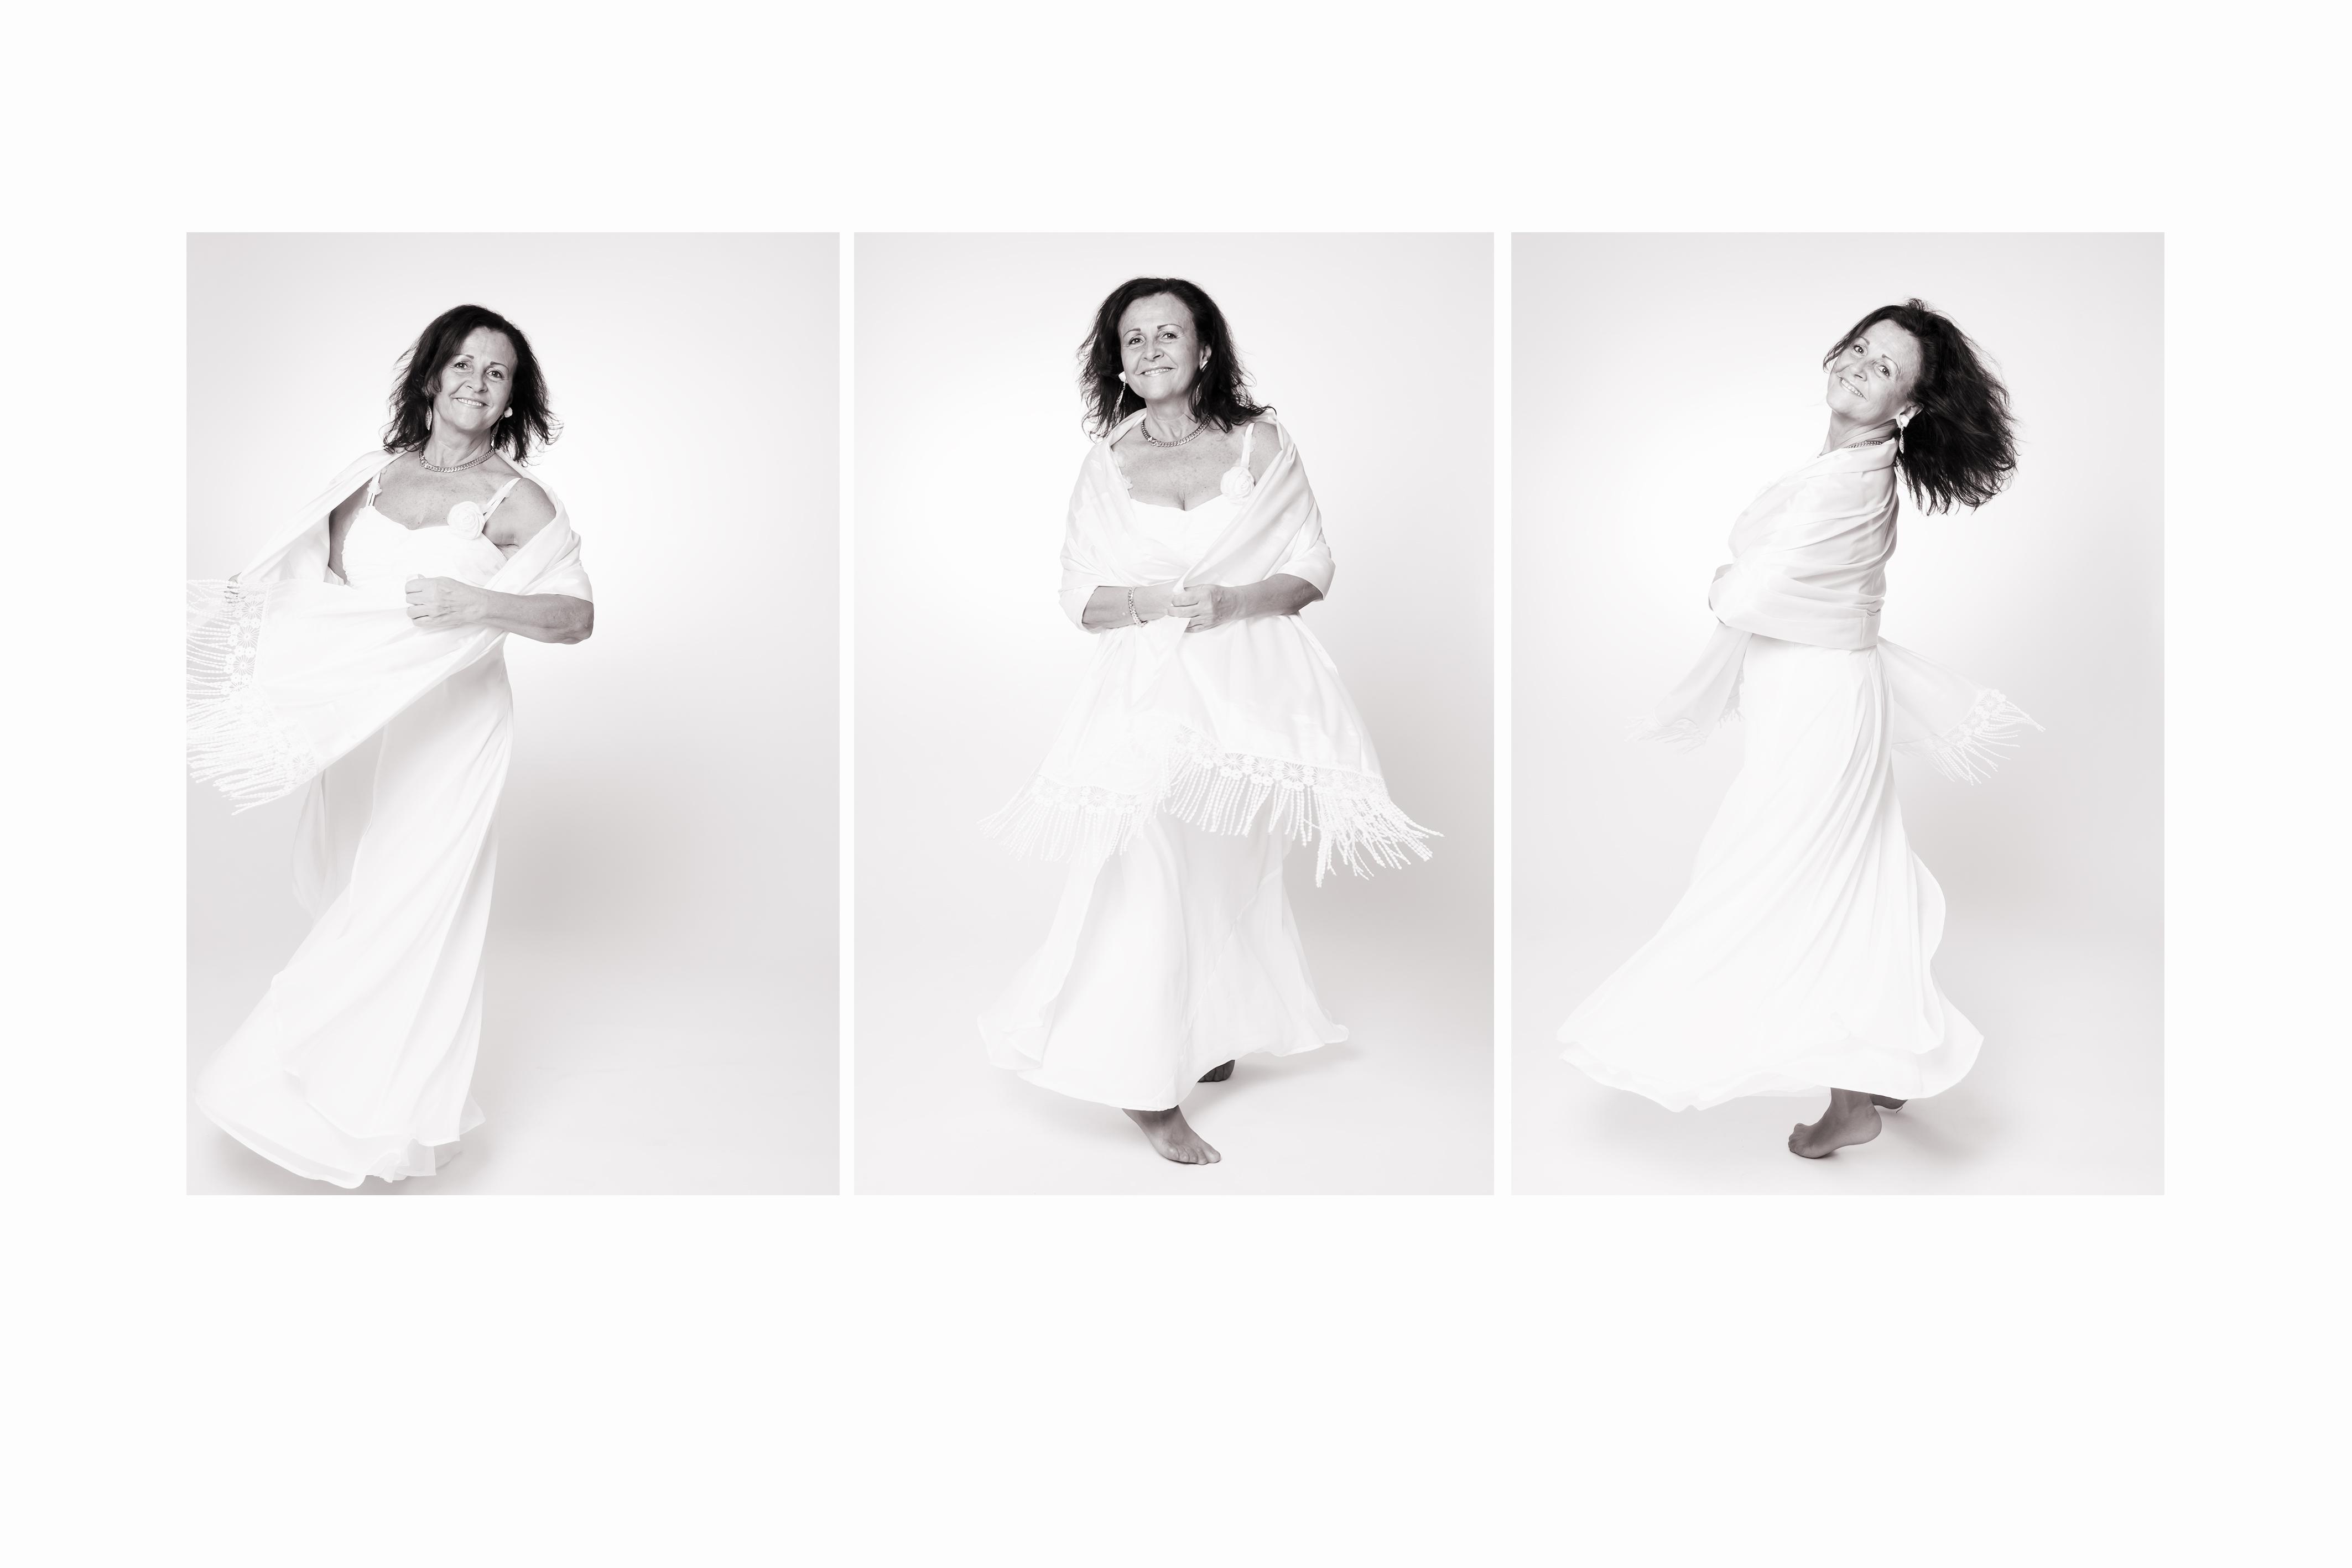 Frauen Portraits_ Nadine Grenningloh 009